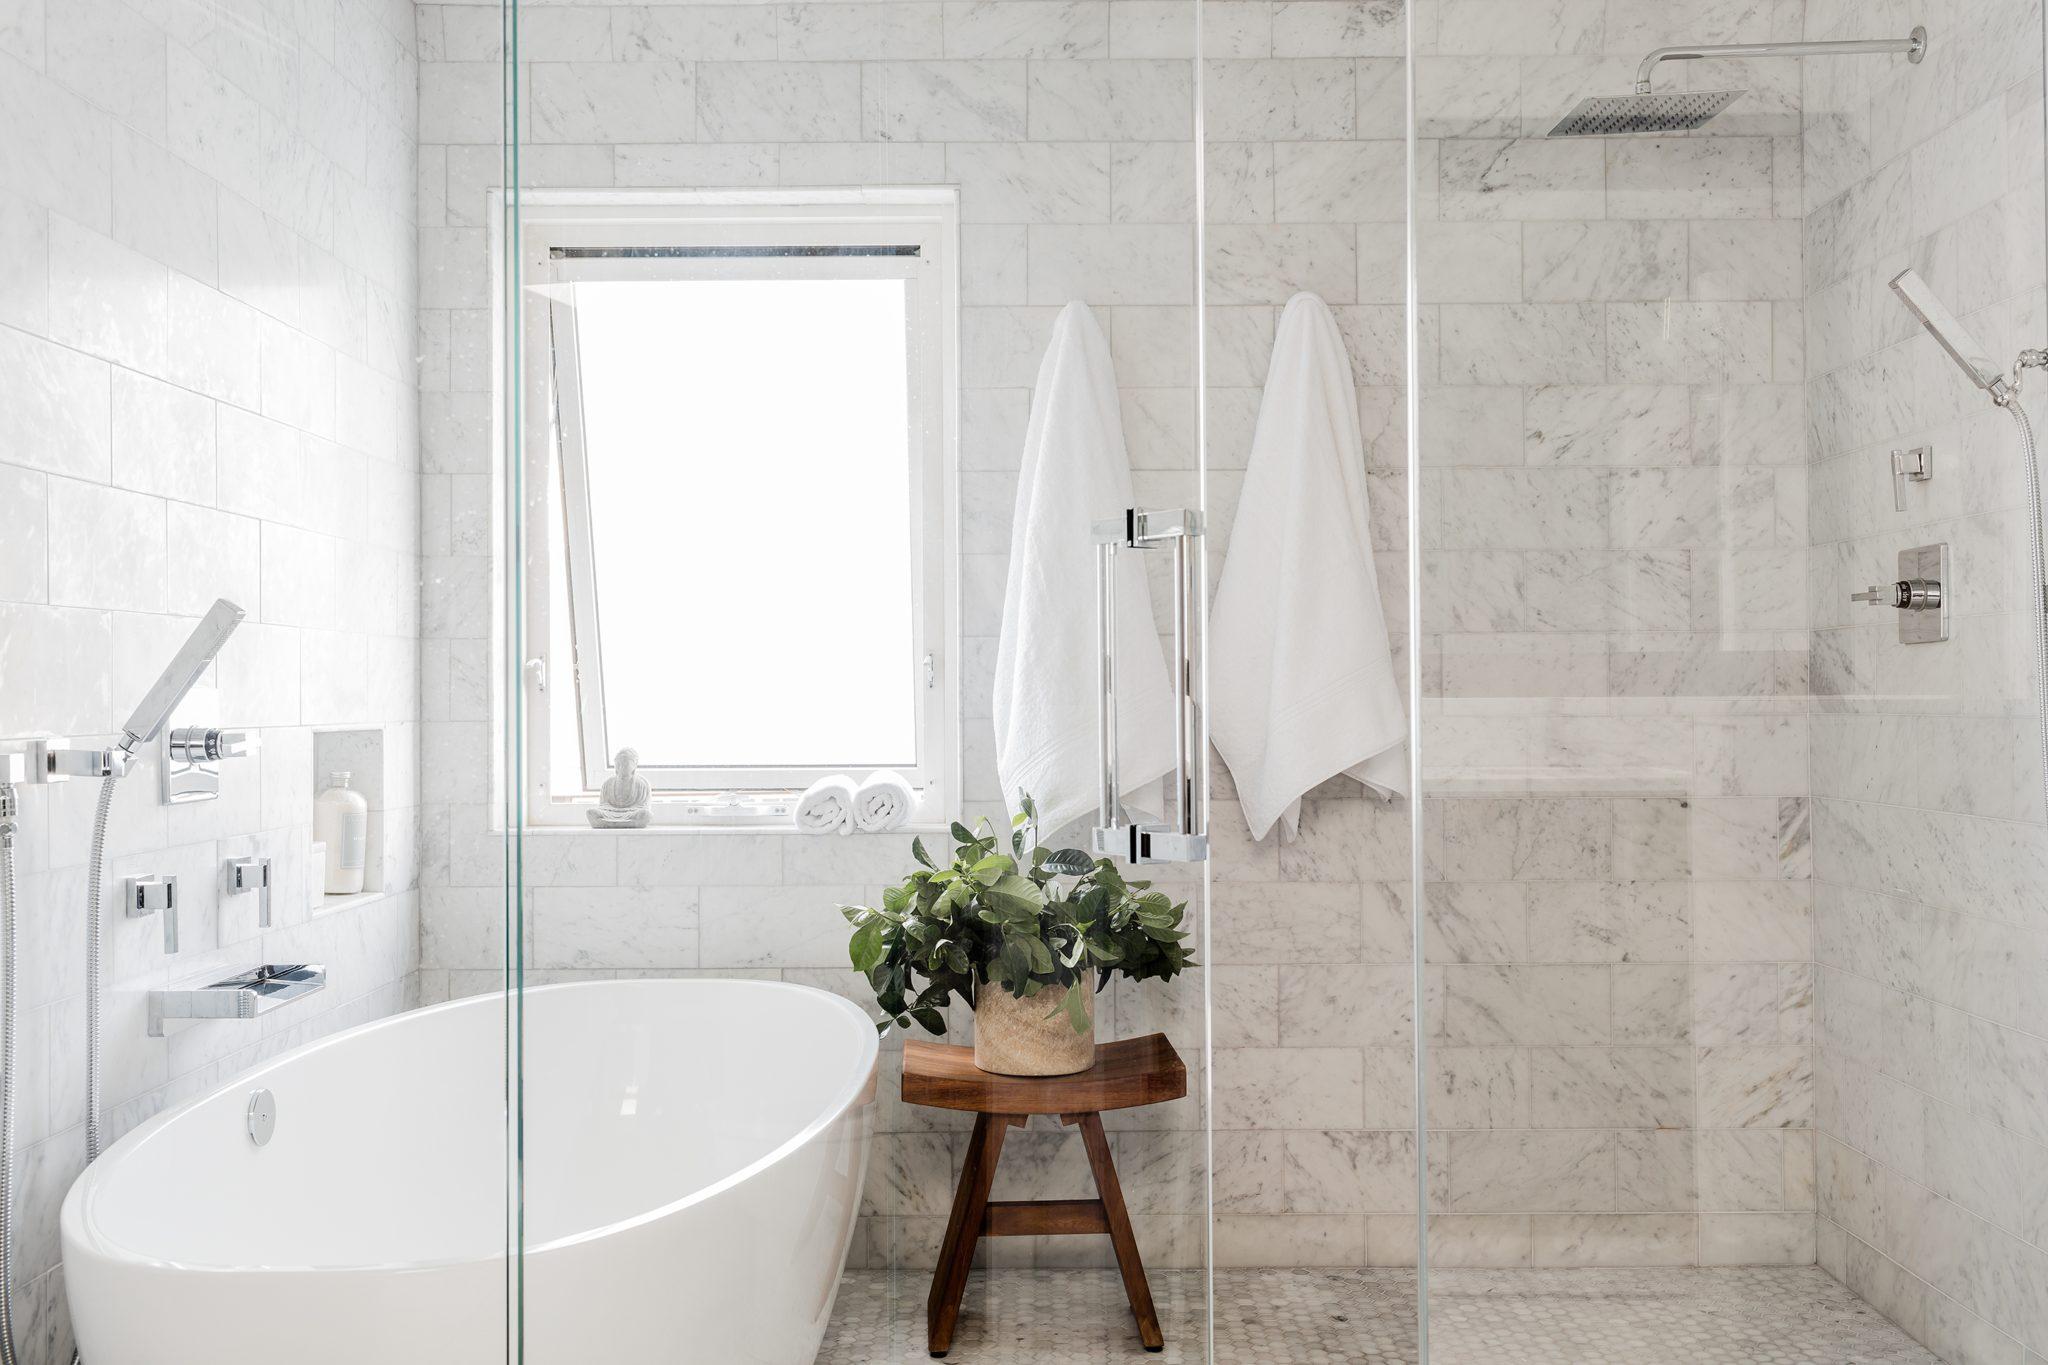 Burroughs Wharf, Master Bathroom by Elms Interior Design